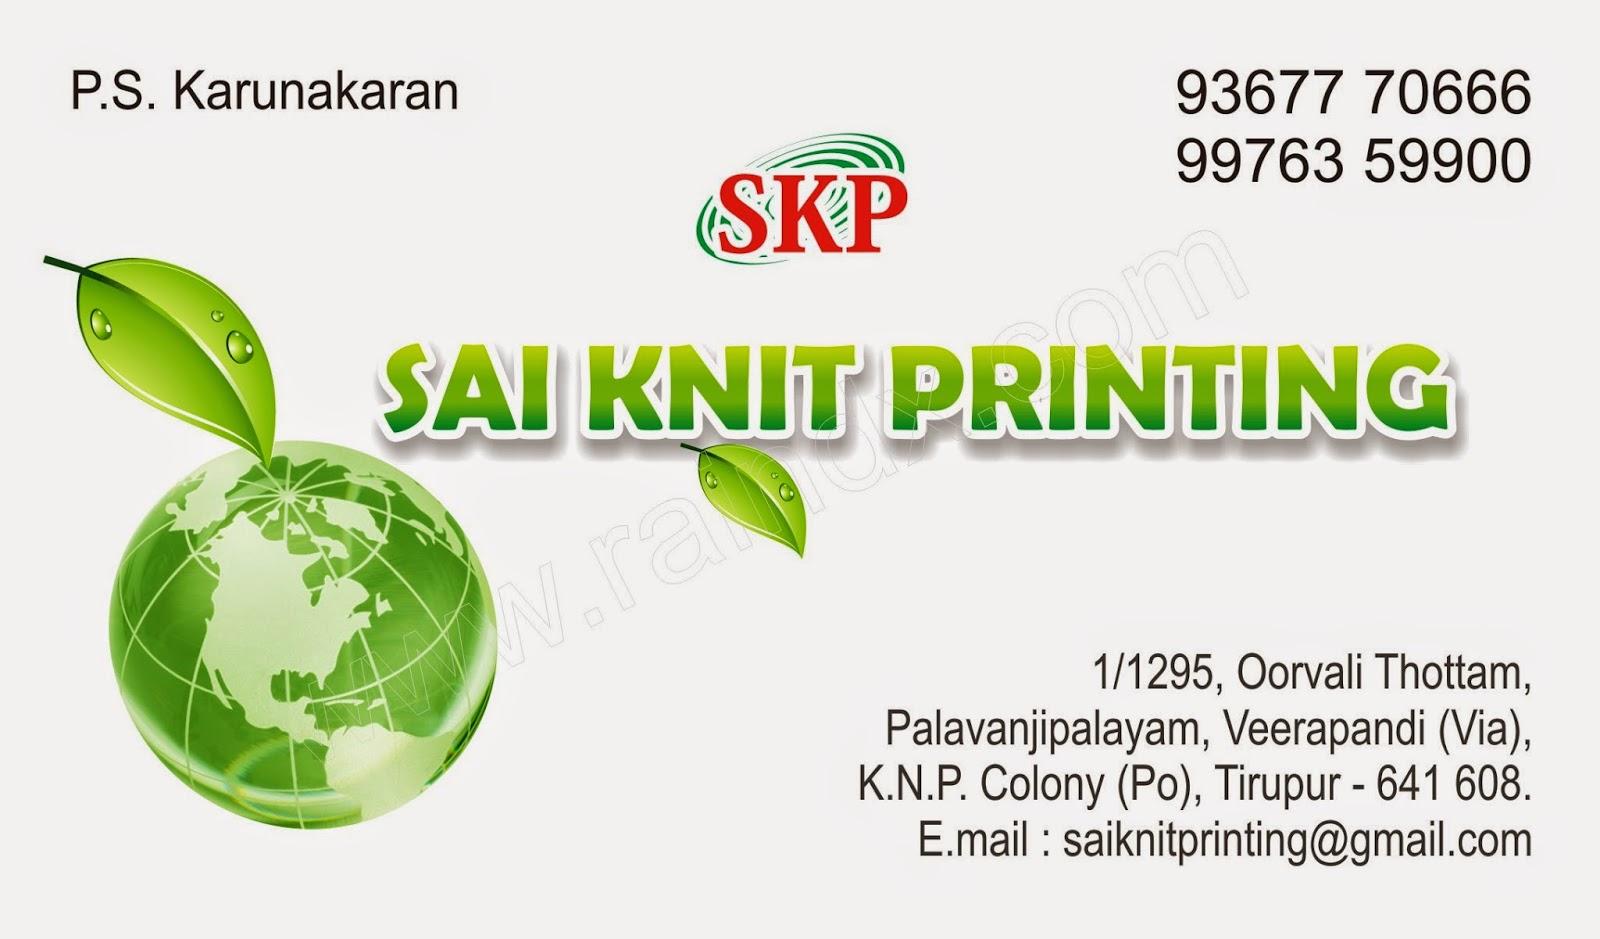 Visiting card design :::SAI KNIT PRINTING TIRUPUR::: - Rain Digital ...